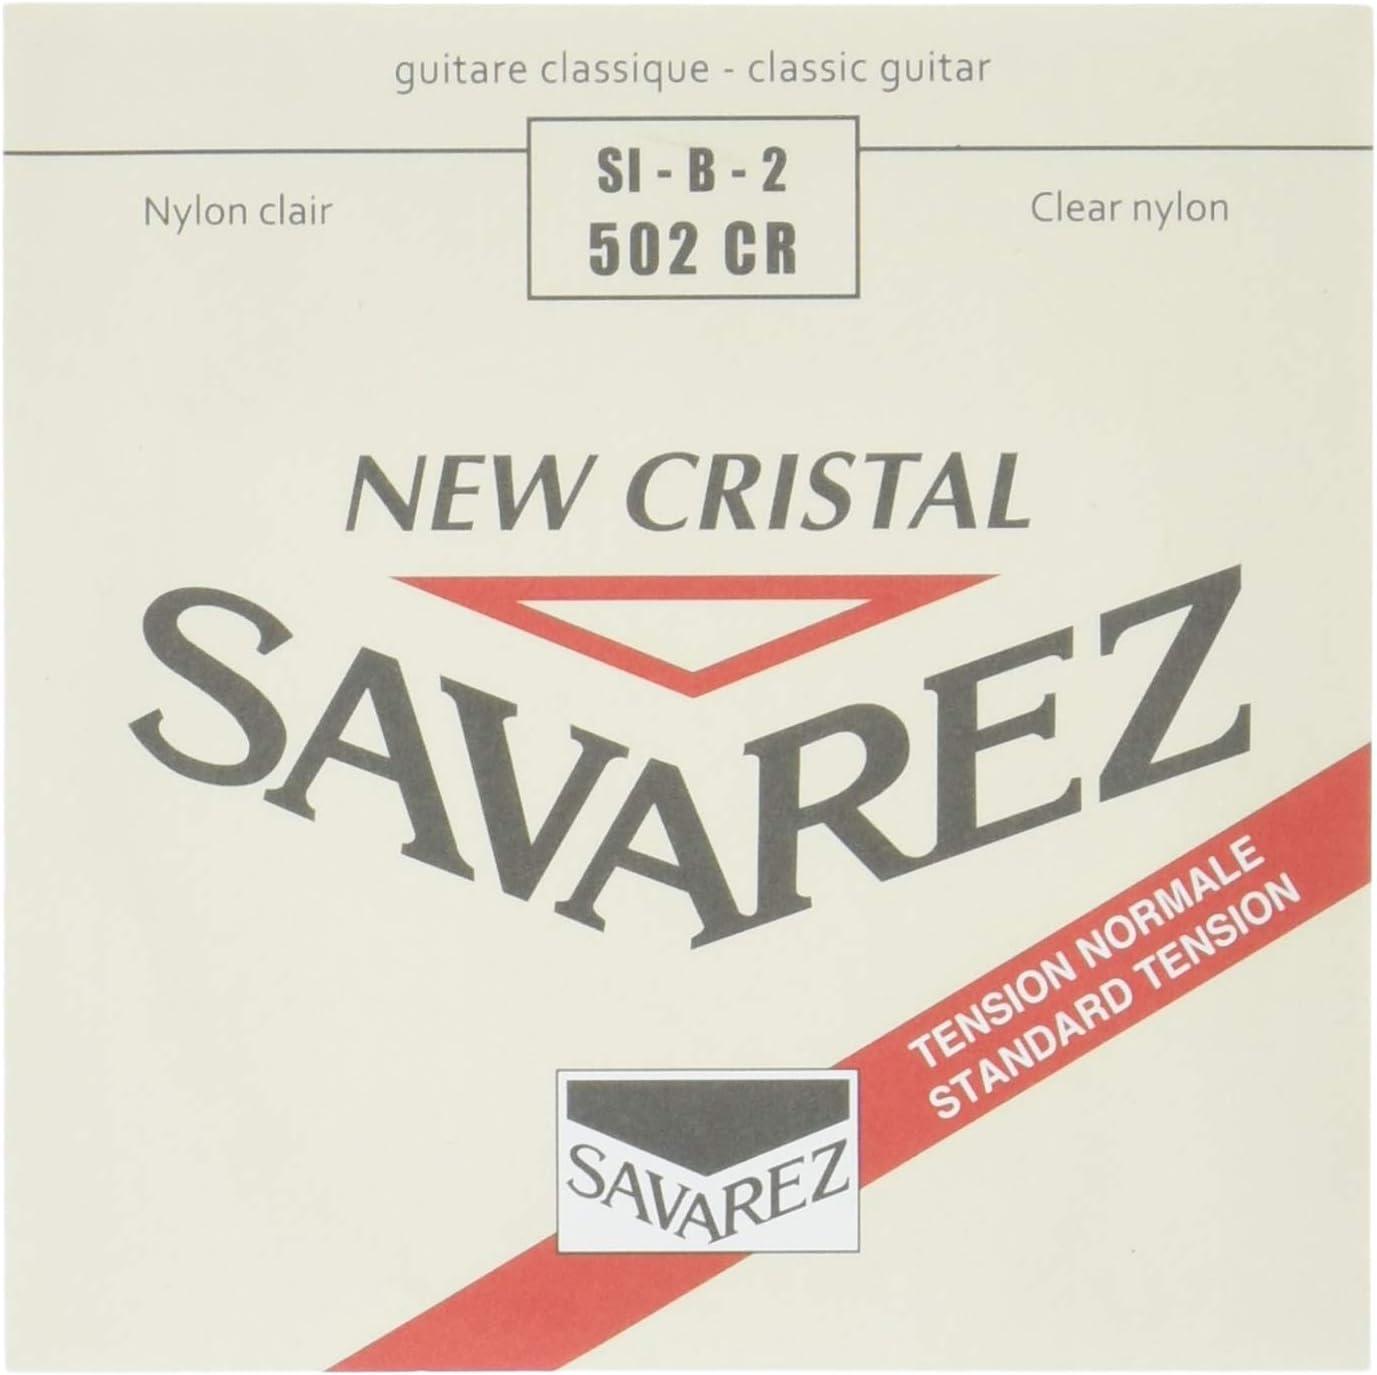 Savarez Cuerdas para Guitarra Clásica Alliance HT Classic 502CR cuerda suelta Si2 New Cristal standard